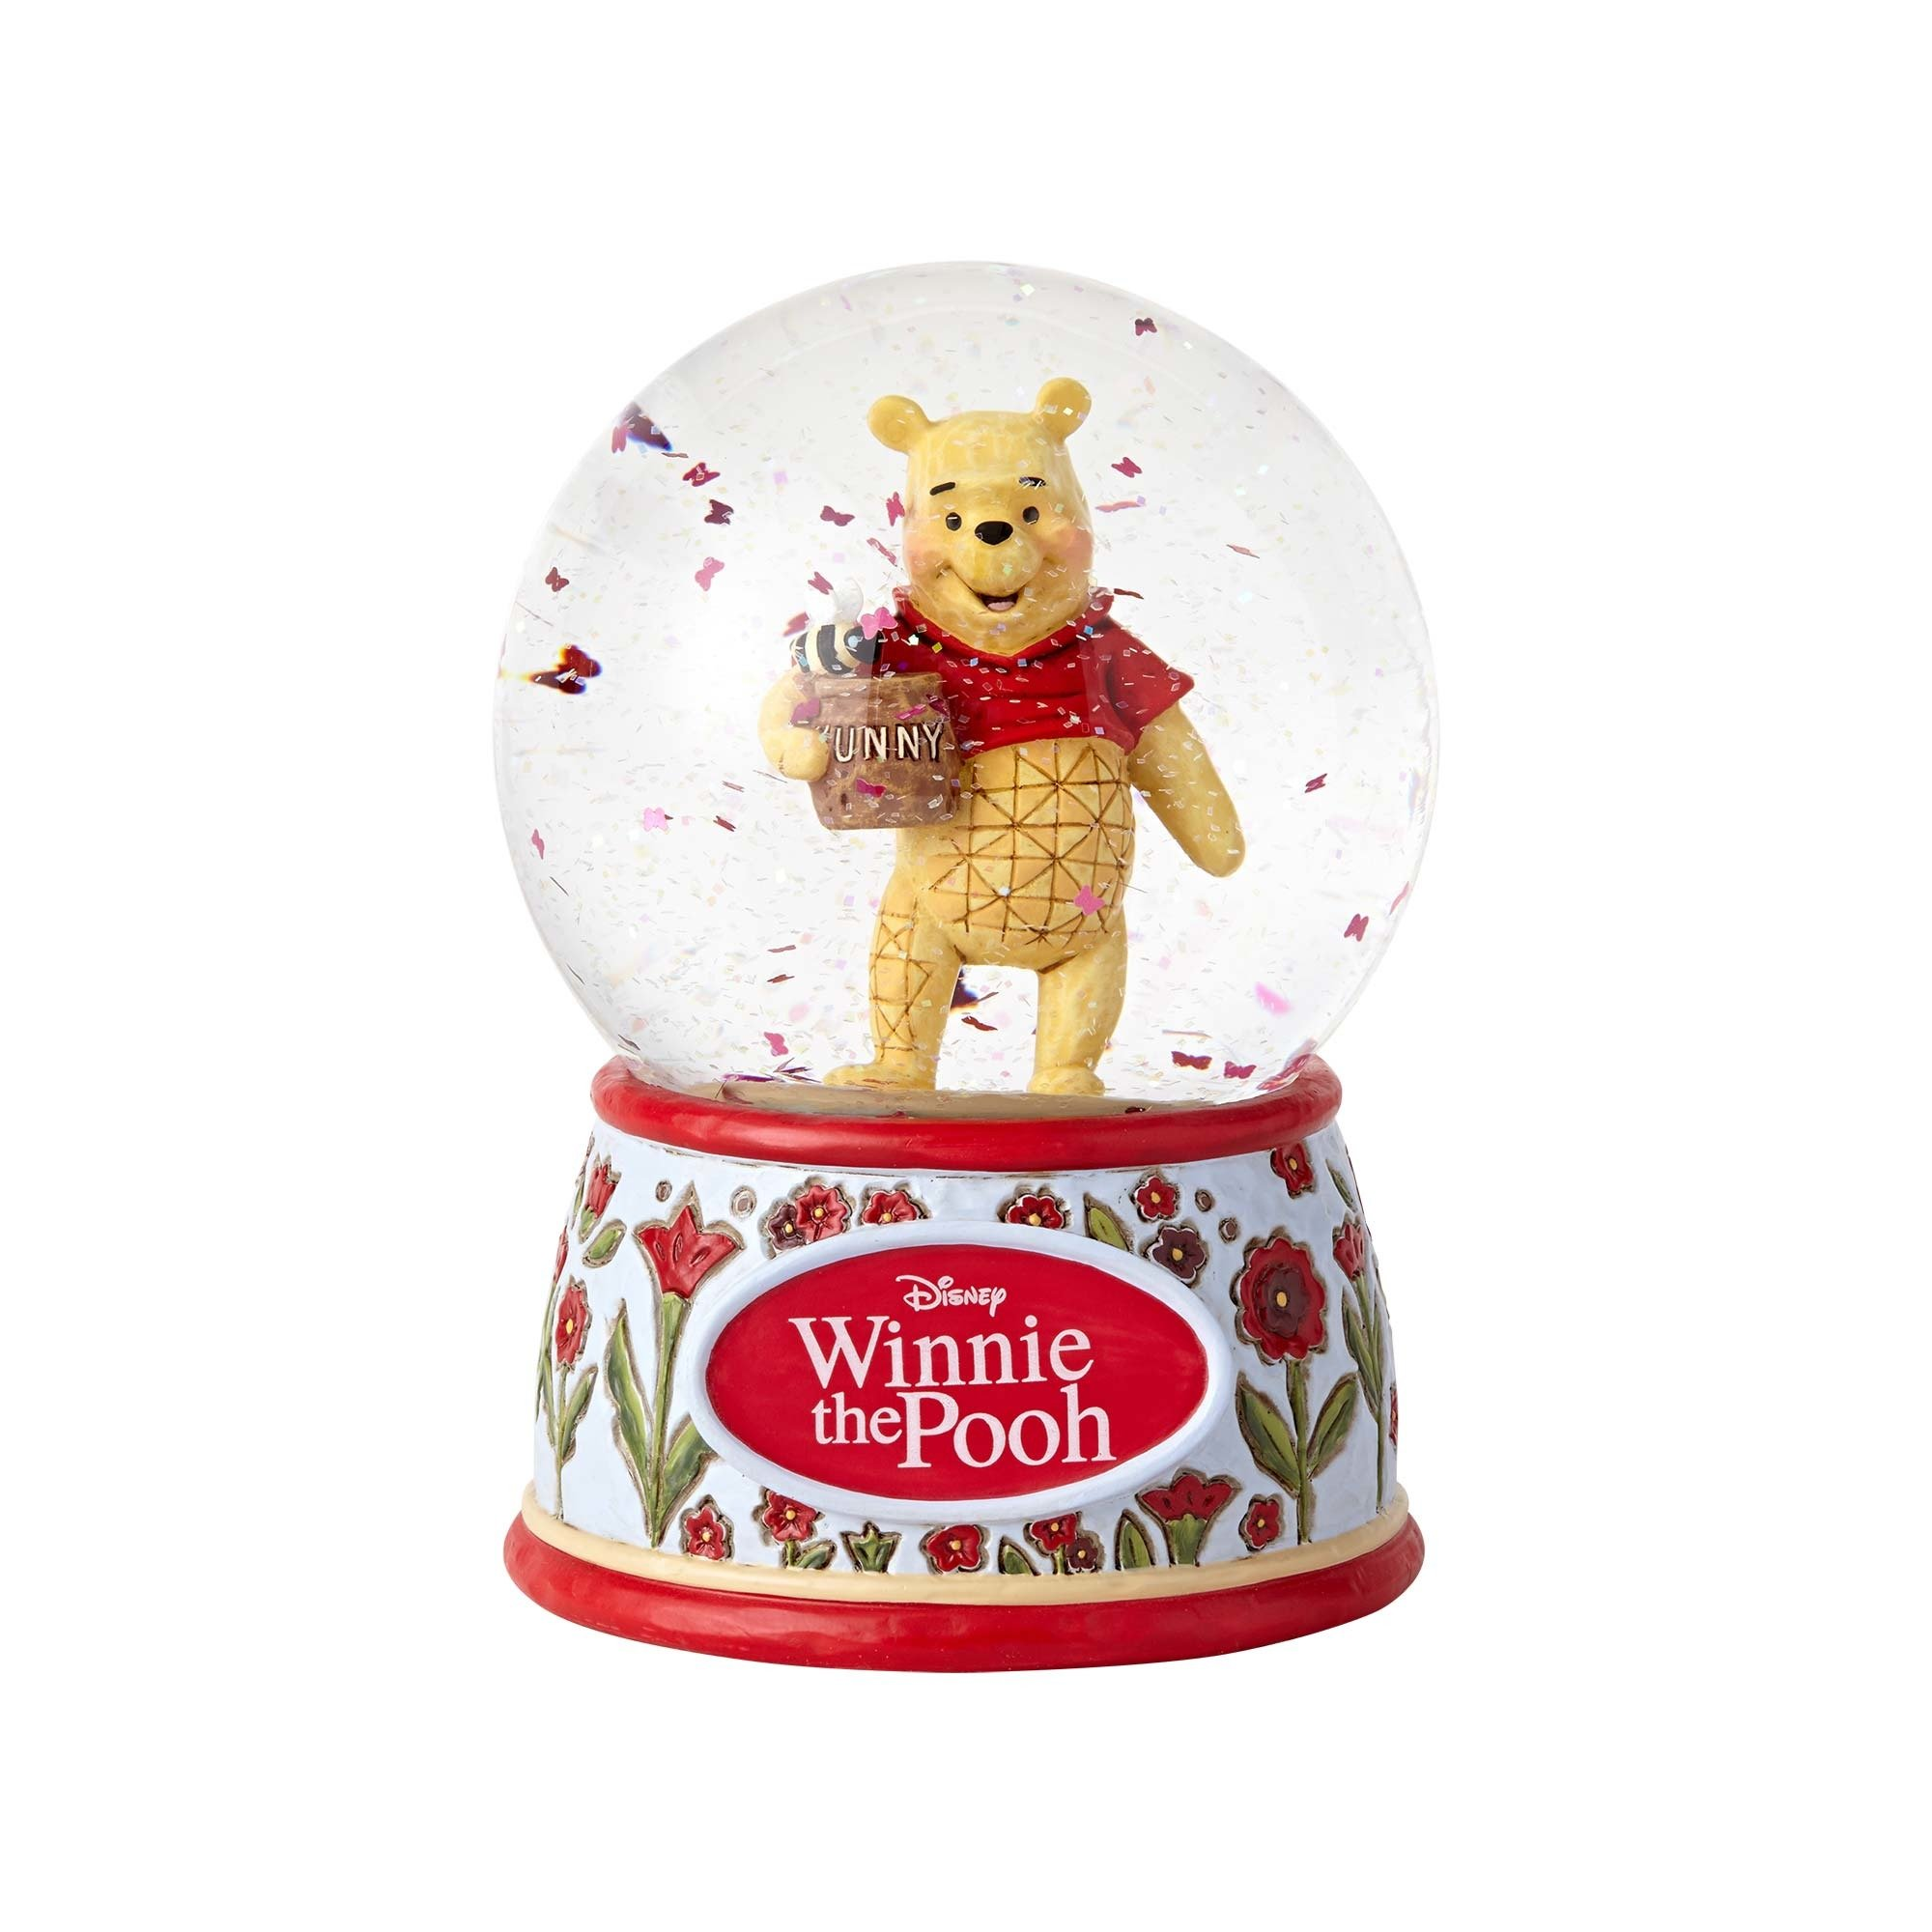 Enesco Disney Traditions Winnie The Pooh Water Globe by Disney